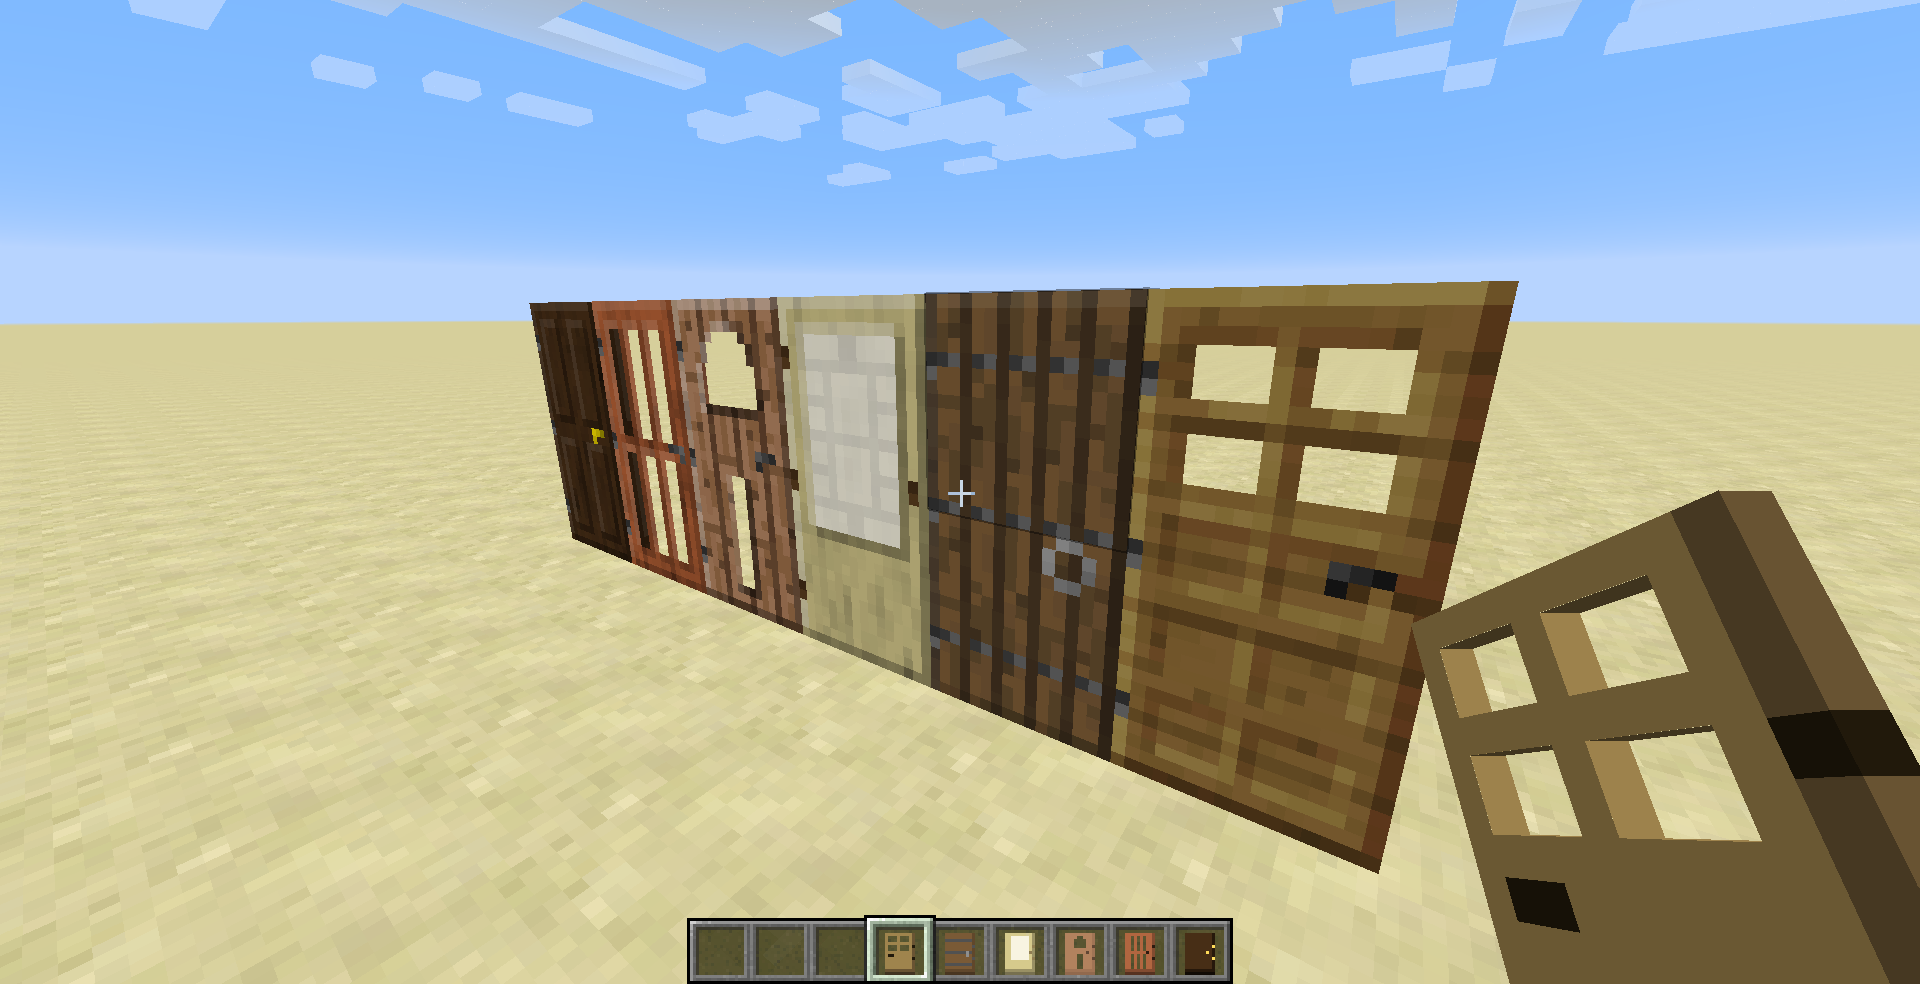 Minecraft derni res news sortie de la snapshot 14w33a for Porte and minecraft